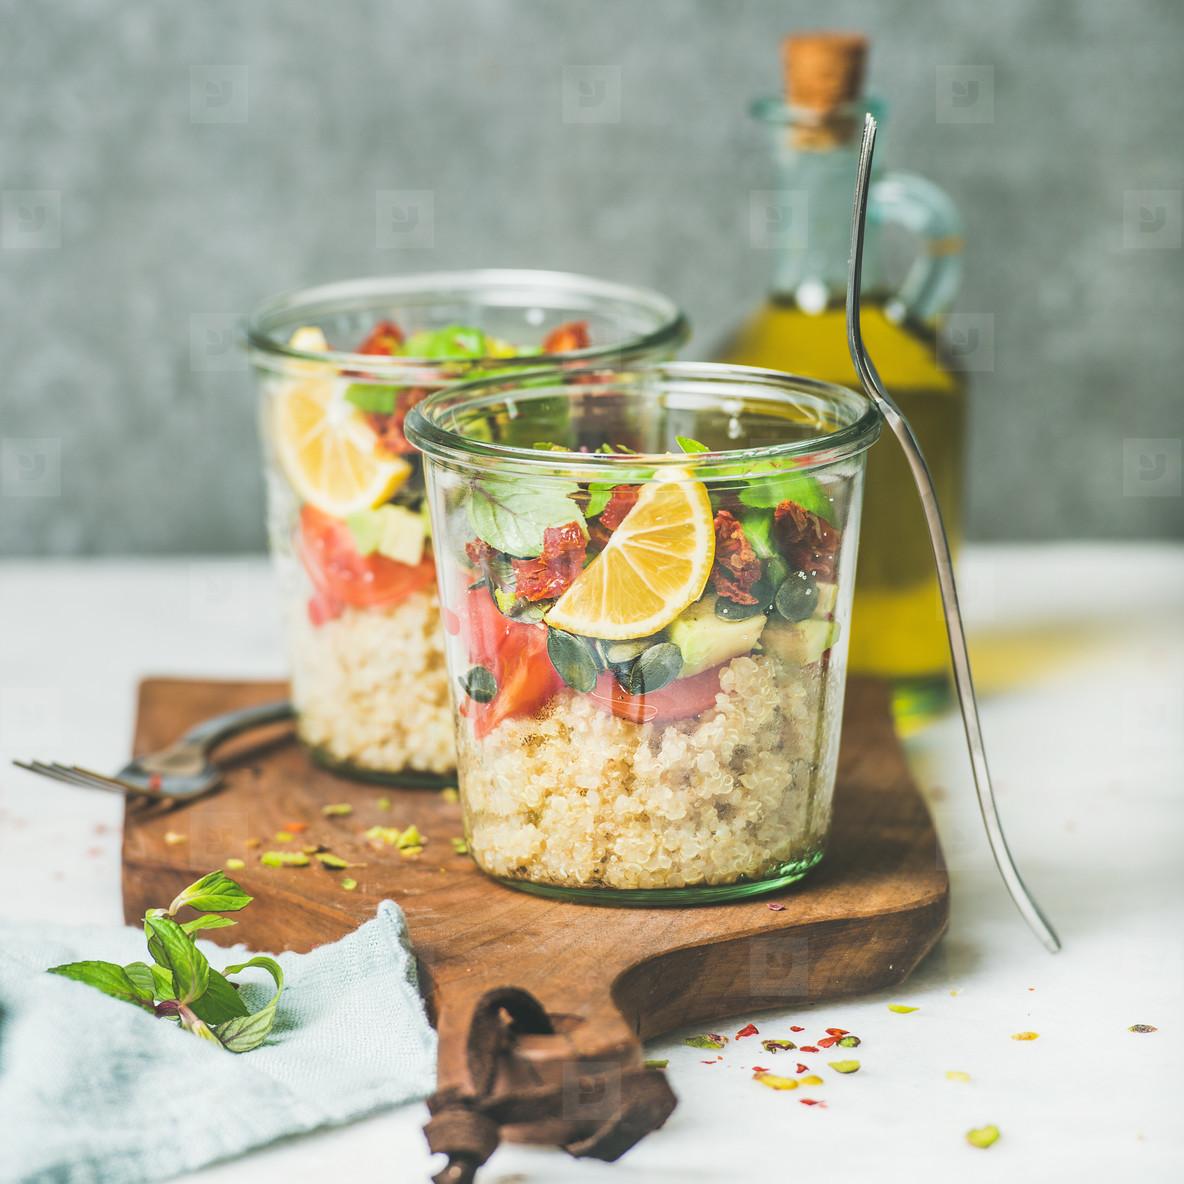 Healthy vegan salad with quionoa  avocado  dried tomatoes  square crop